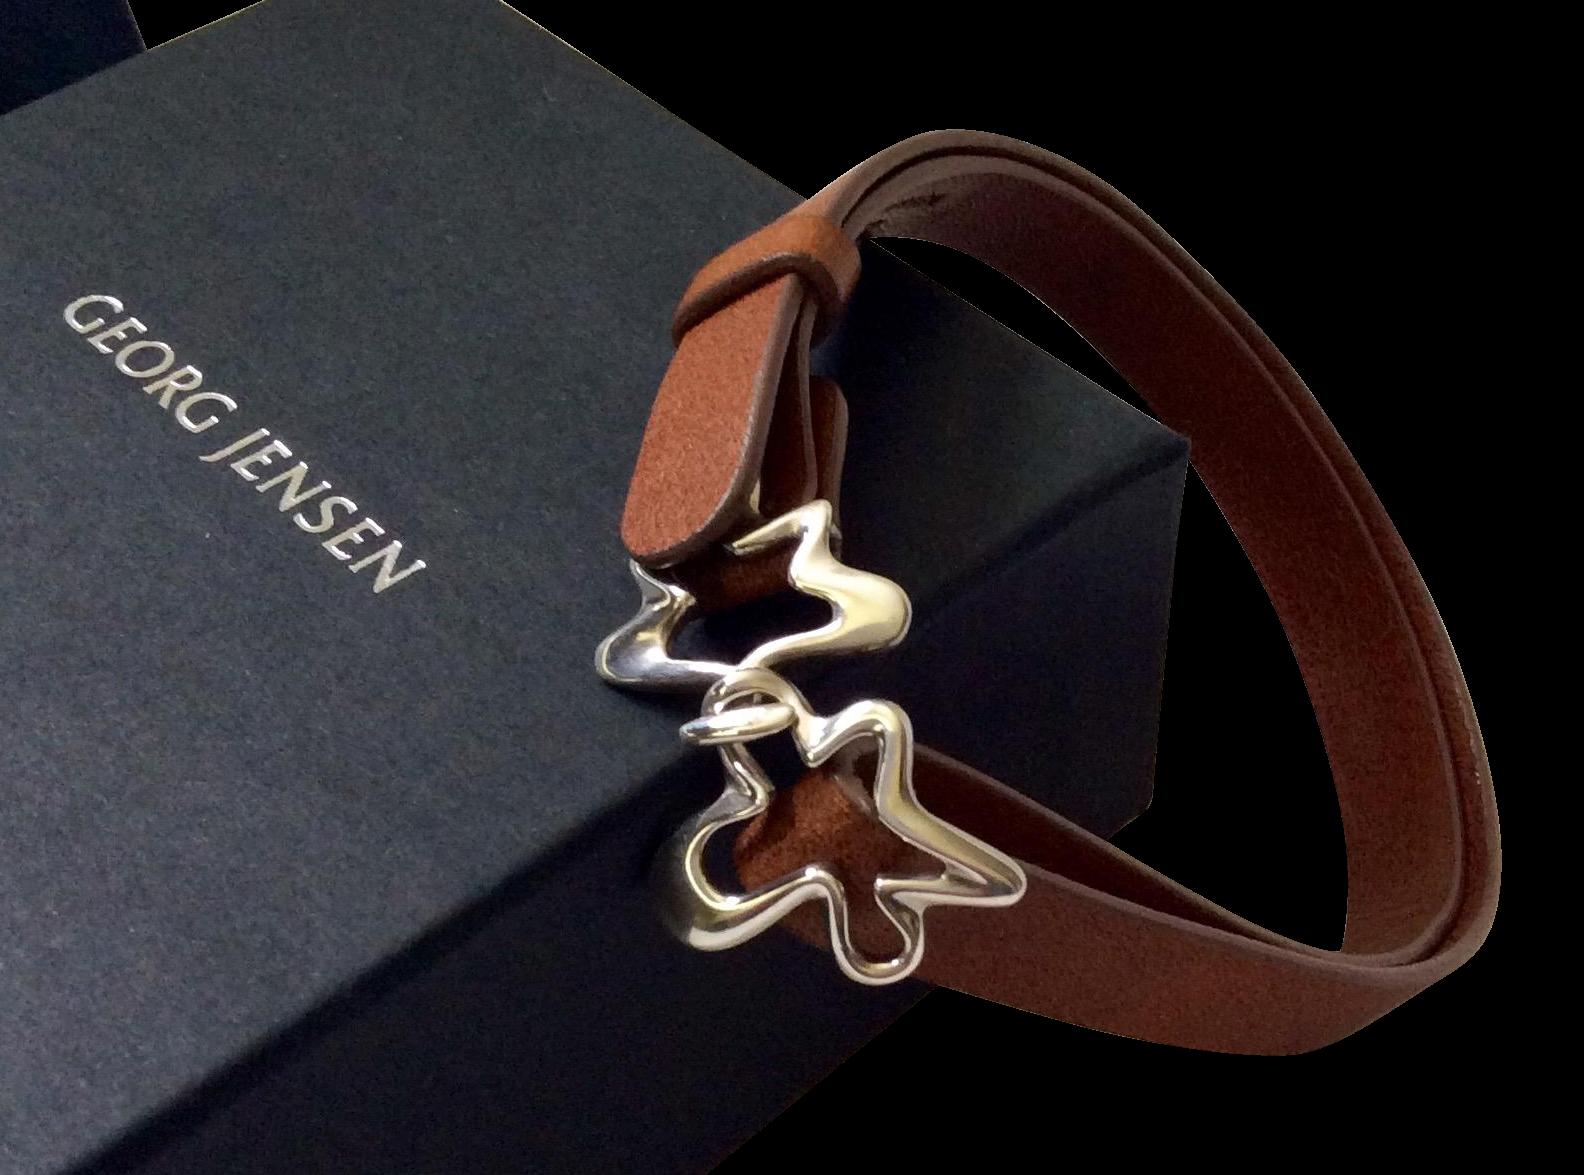 georg jensen splash bracelet in gift box henning koppel design from archetypes on ruby lane. Black Bedroom Furniture Sets. Home Design Ideas